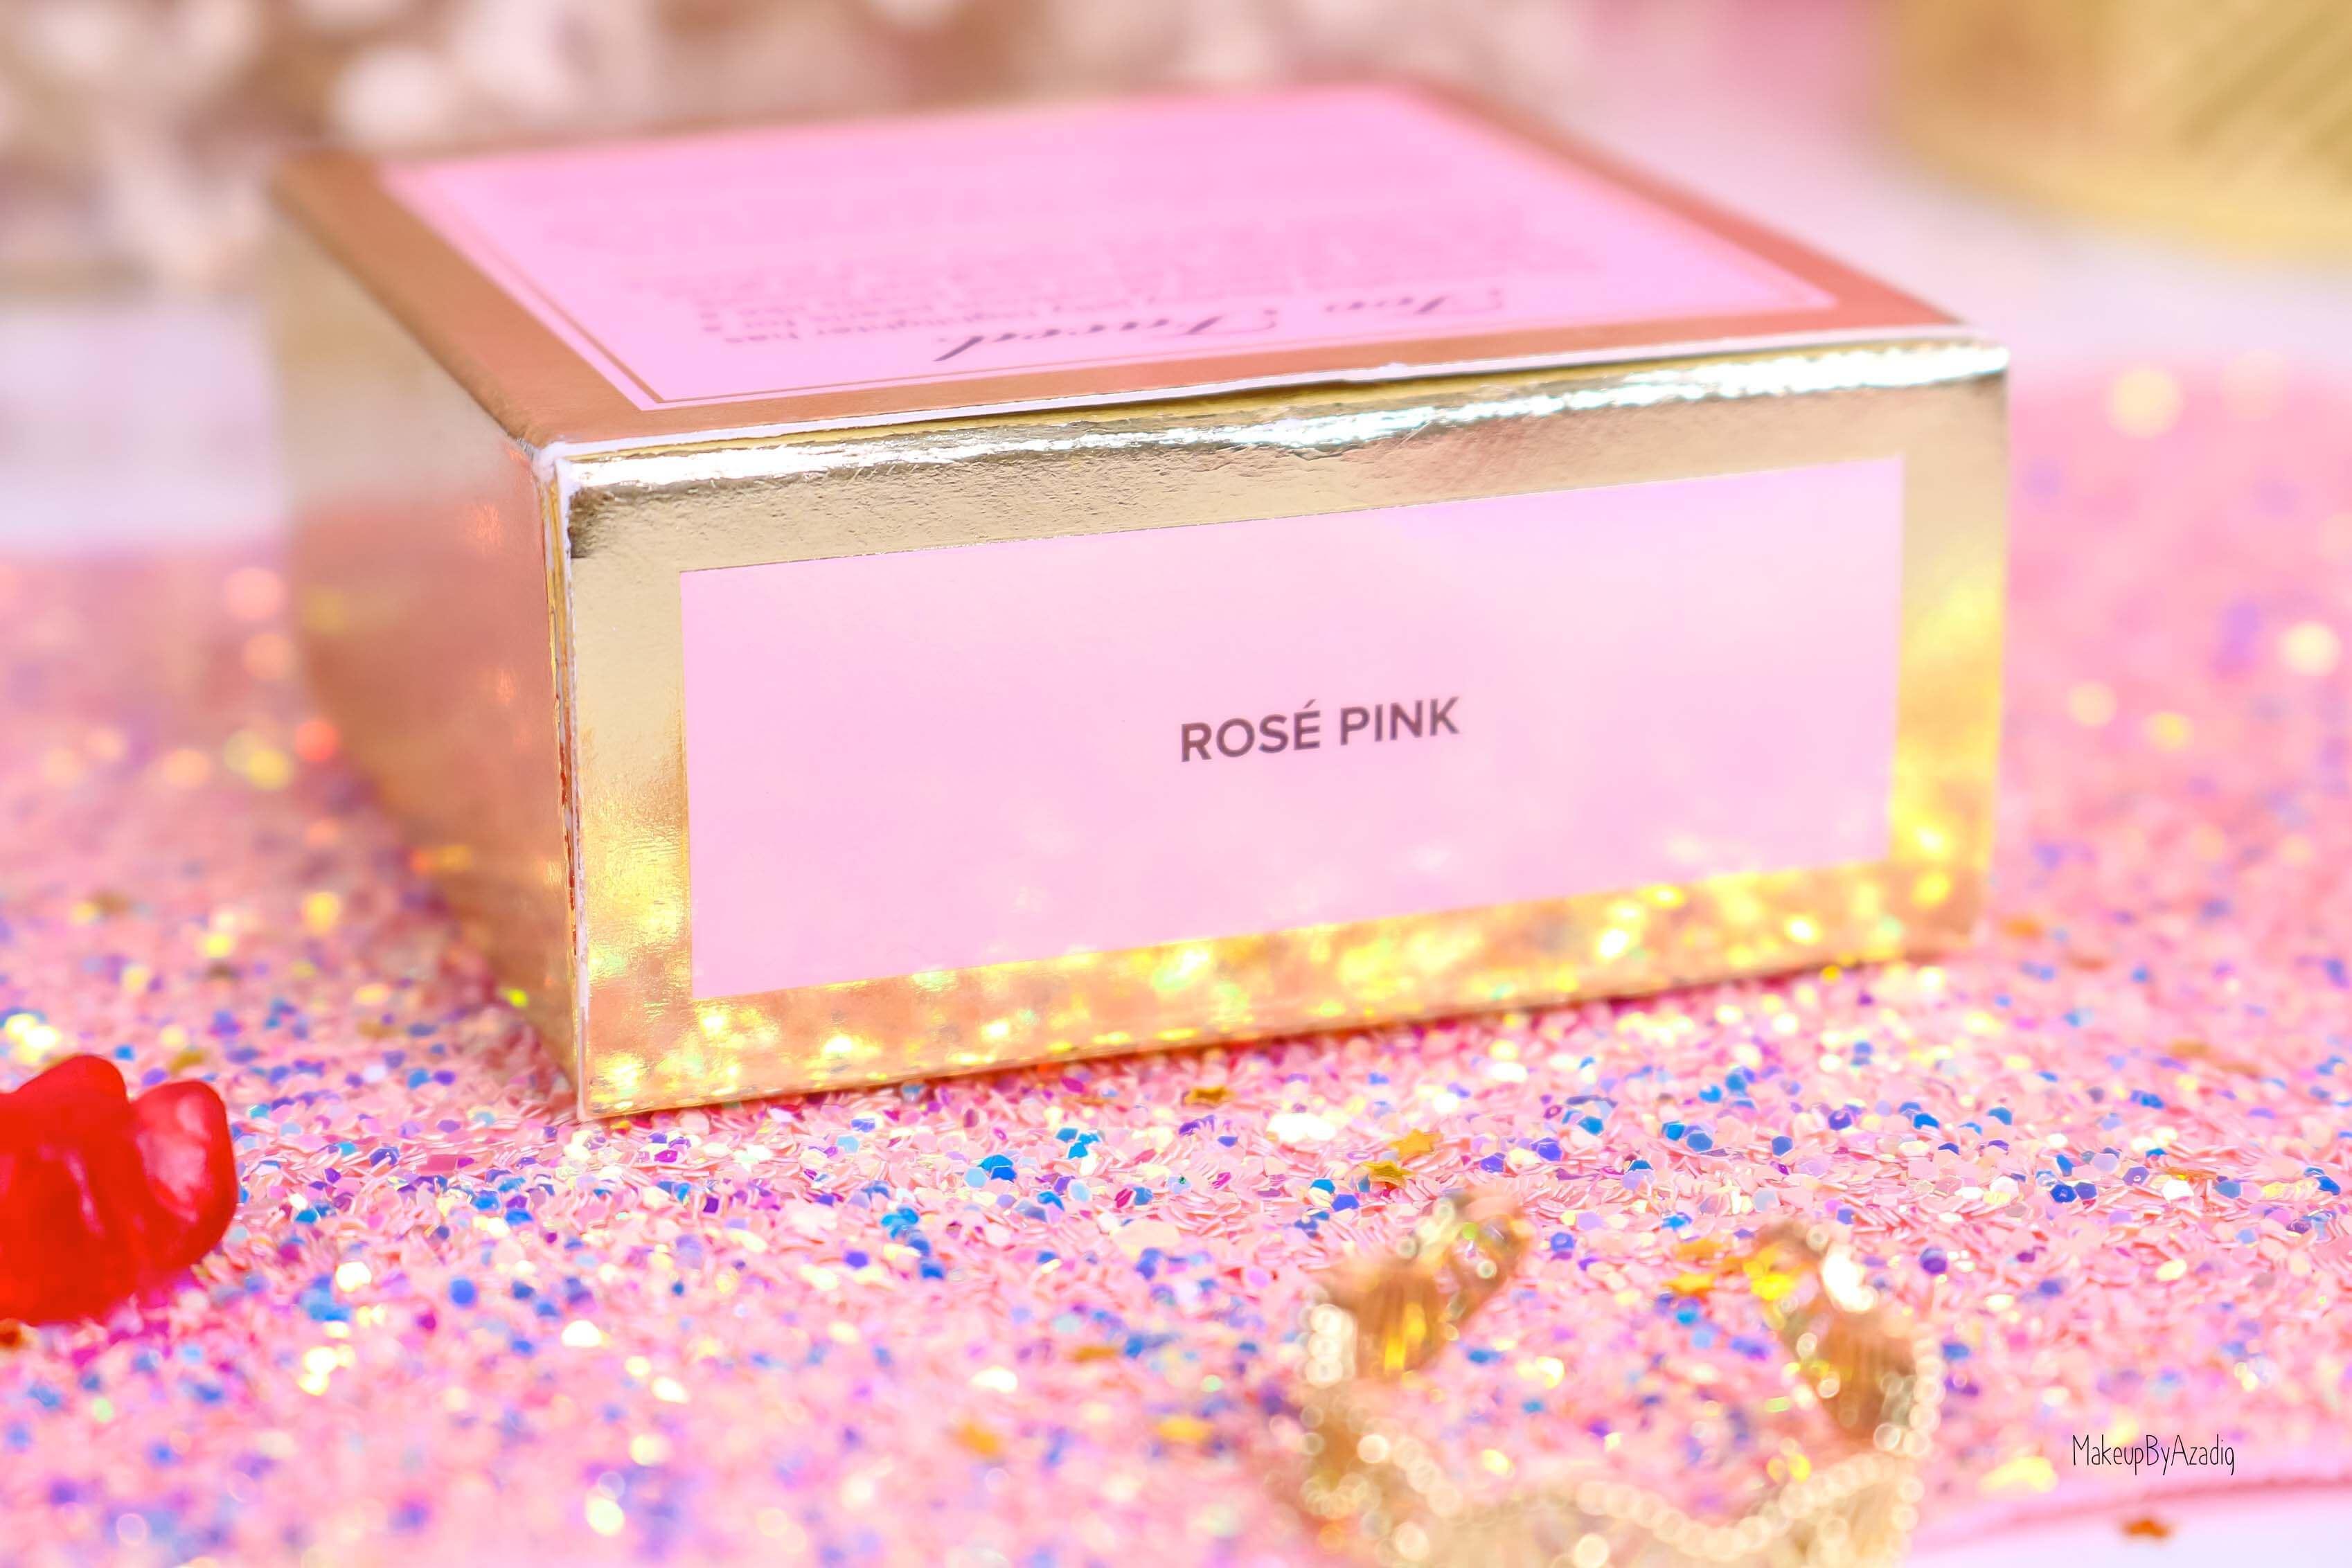 revue-highlighter-jelly-gel-rose-pink-too-faced-texture-cute-avis-prix-swatch-makeupbyazadig-sephora-france-teinte